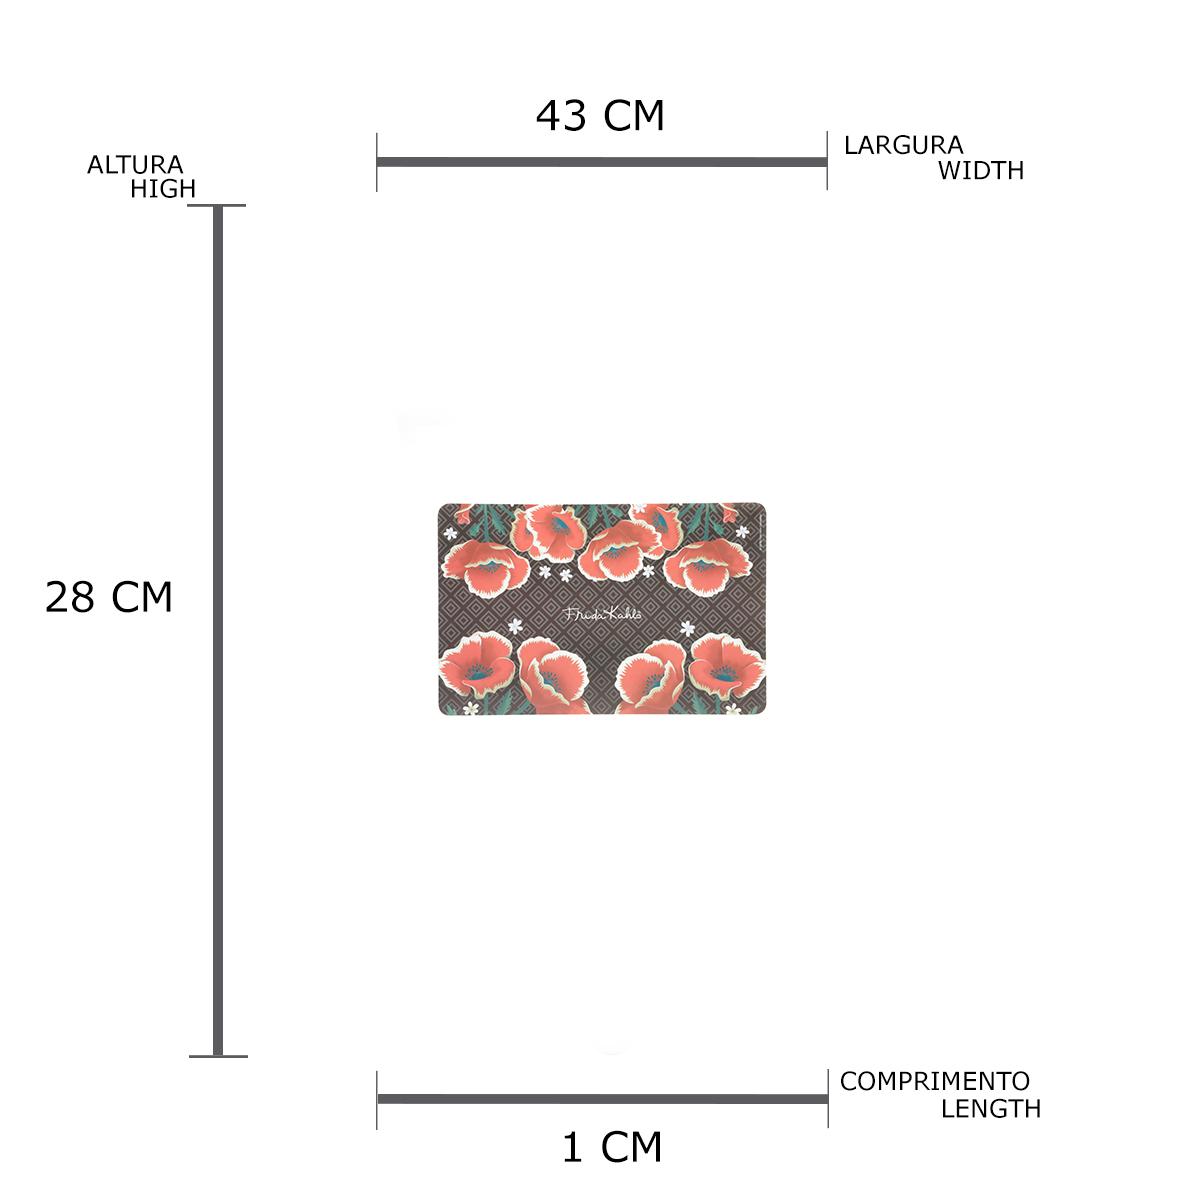 Jogo Americano Plástico Fk Red Flowers Fd Preto 0.1 x 43.5 x 28.3 cm - 4 peças